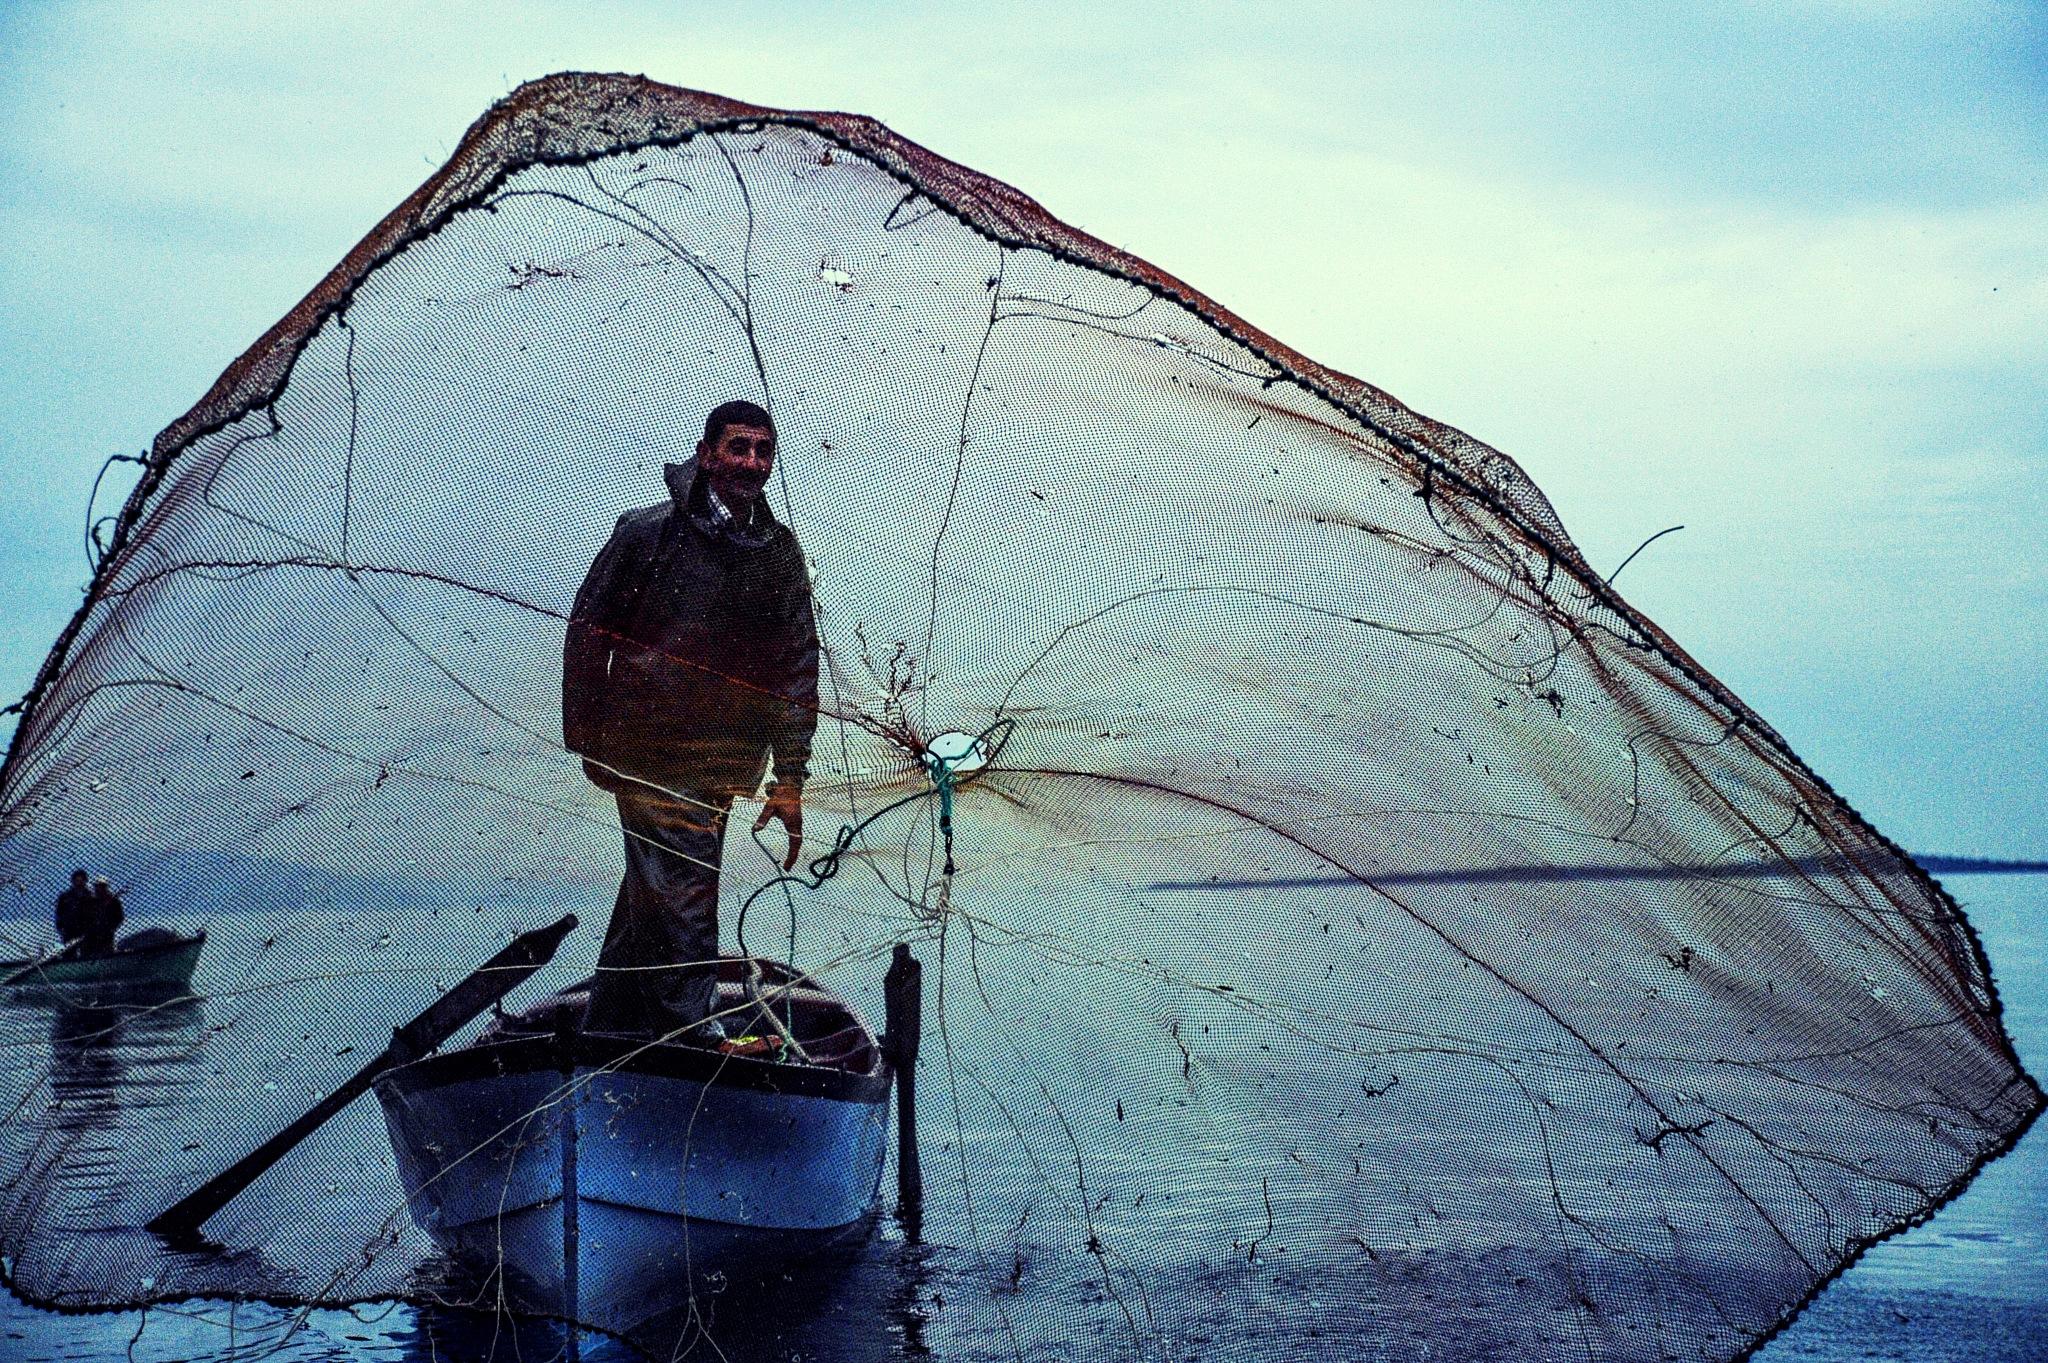 fisherman and his net by Muhsin Özcan